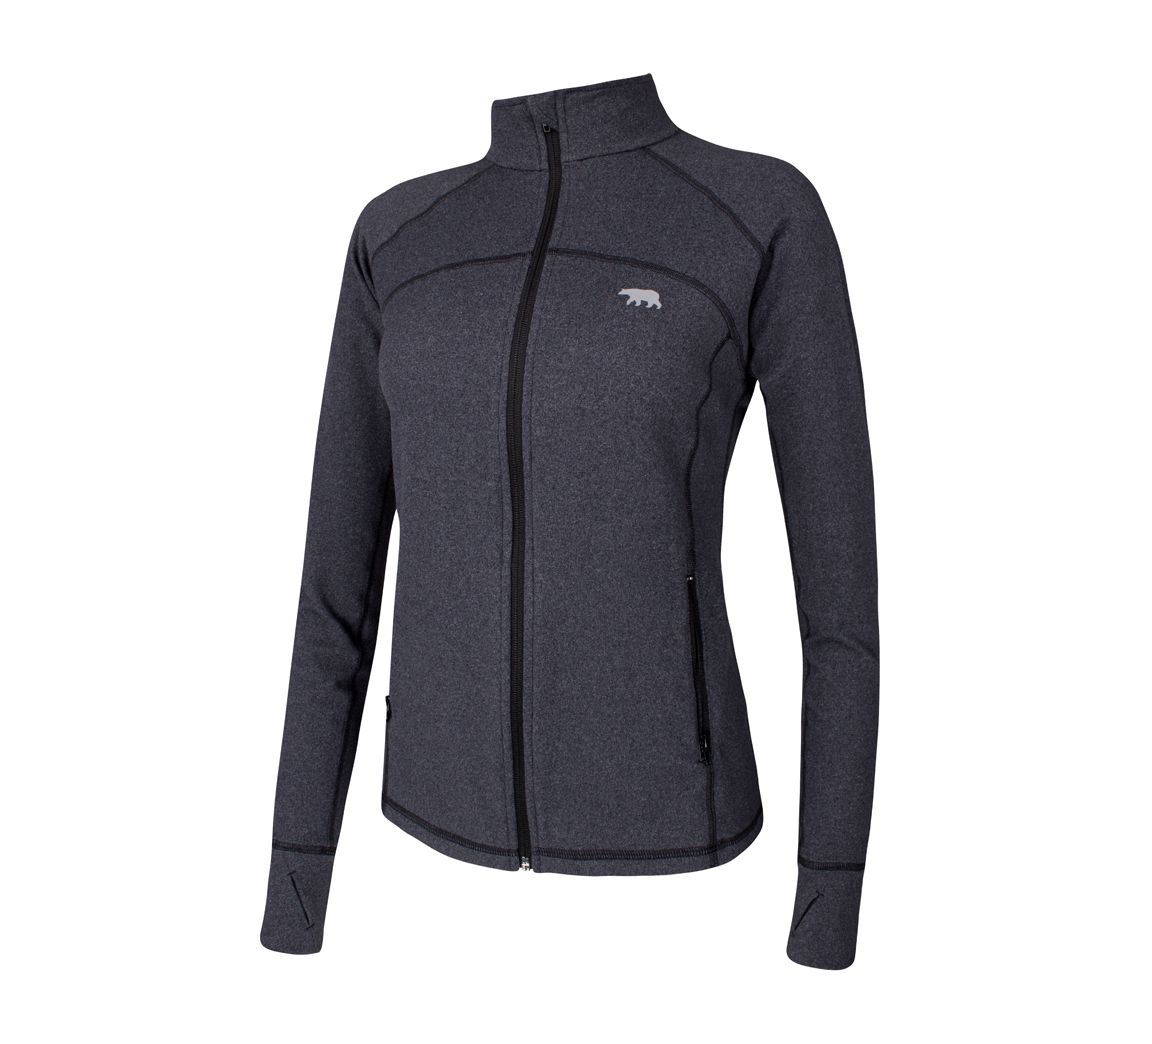 Running Bare Cardio Zip Jacket Zip jackets, Jackets, Gym